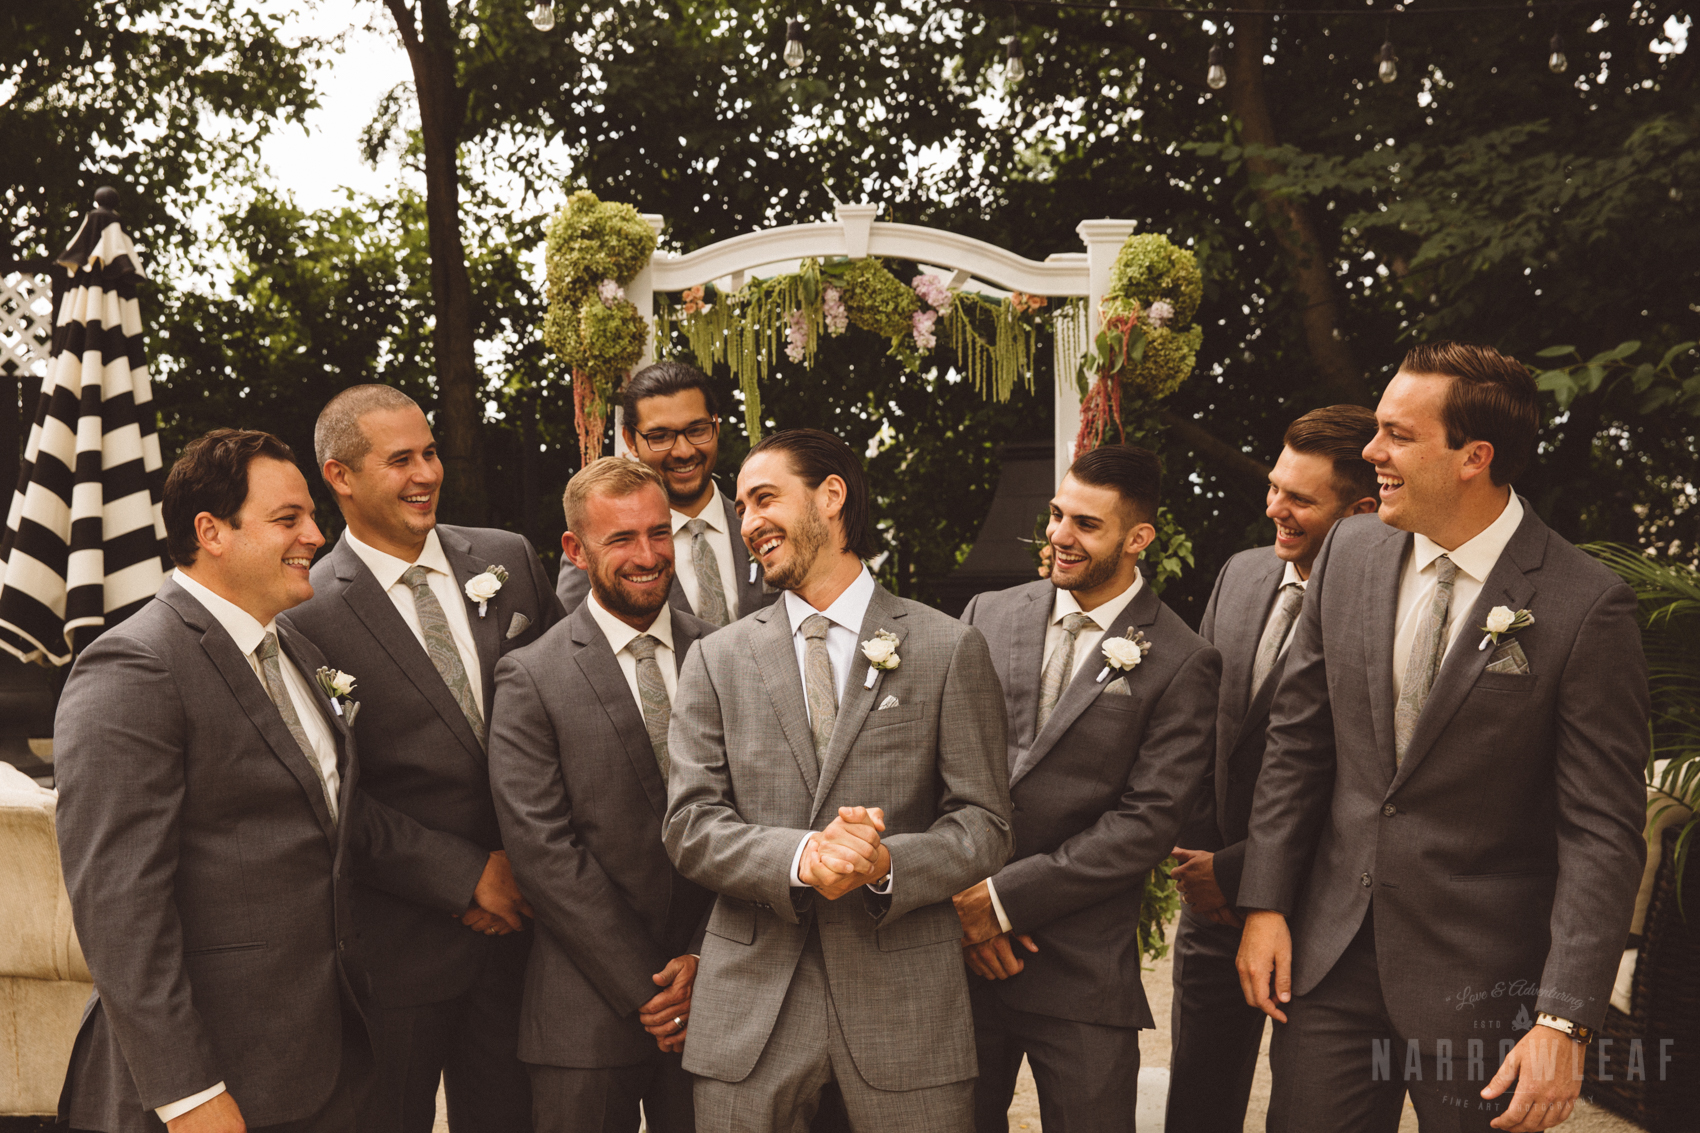 Lake-Geneva-WI-Wedding-bridal-party-formals-3597.jpg